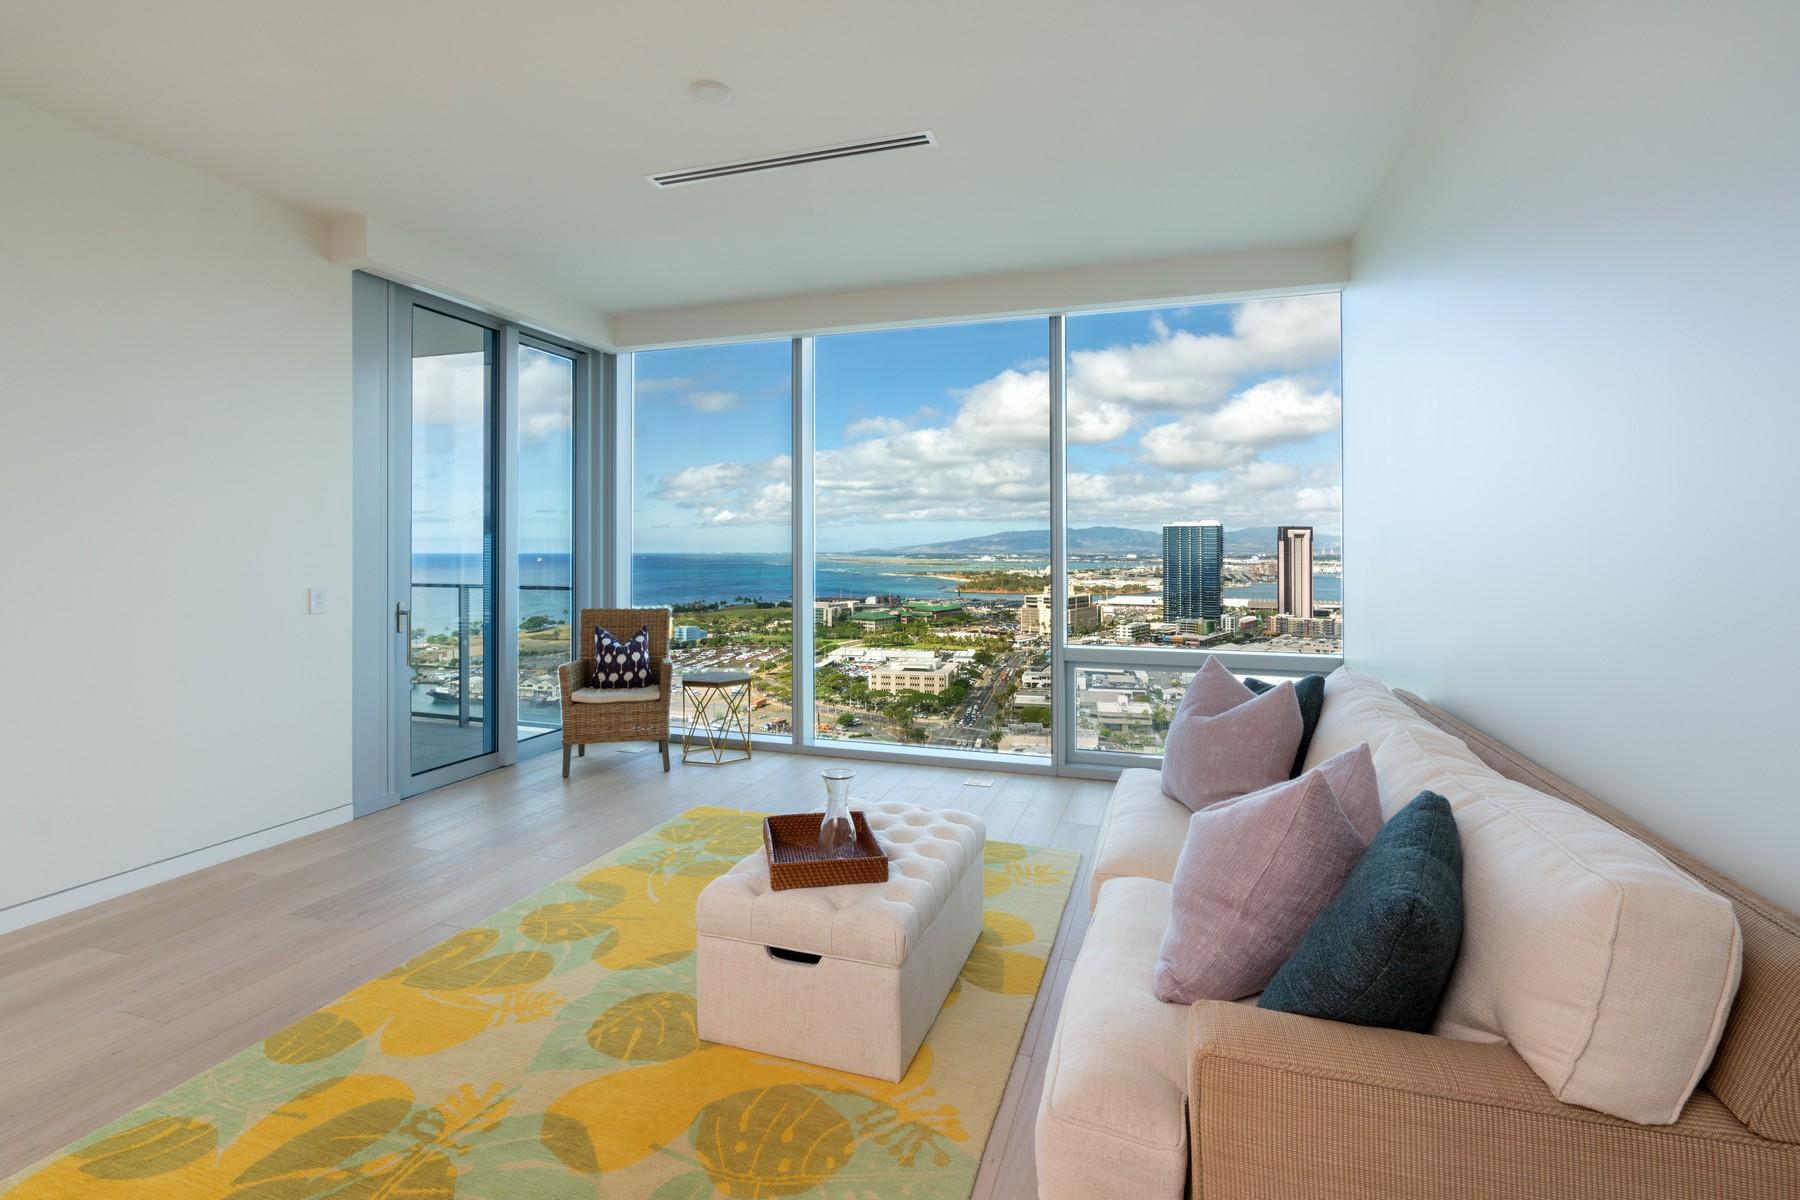 Appartement en copropriété pour l Vente à Panoramic Ocean View Waiea Condo 1118 Ala Moana Blvd #2903 Kakaako, Honolulu, Hawaii, 96814 États-Unis